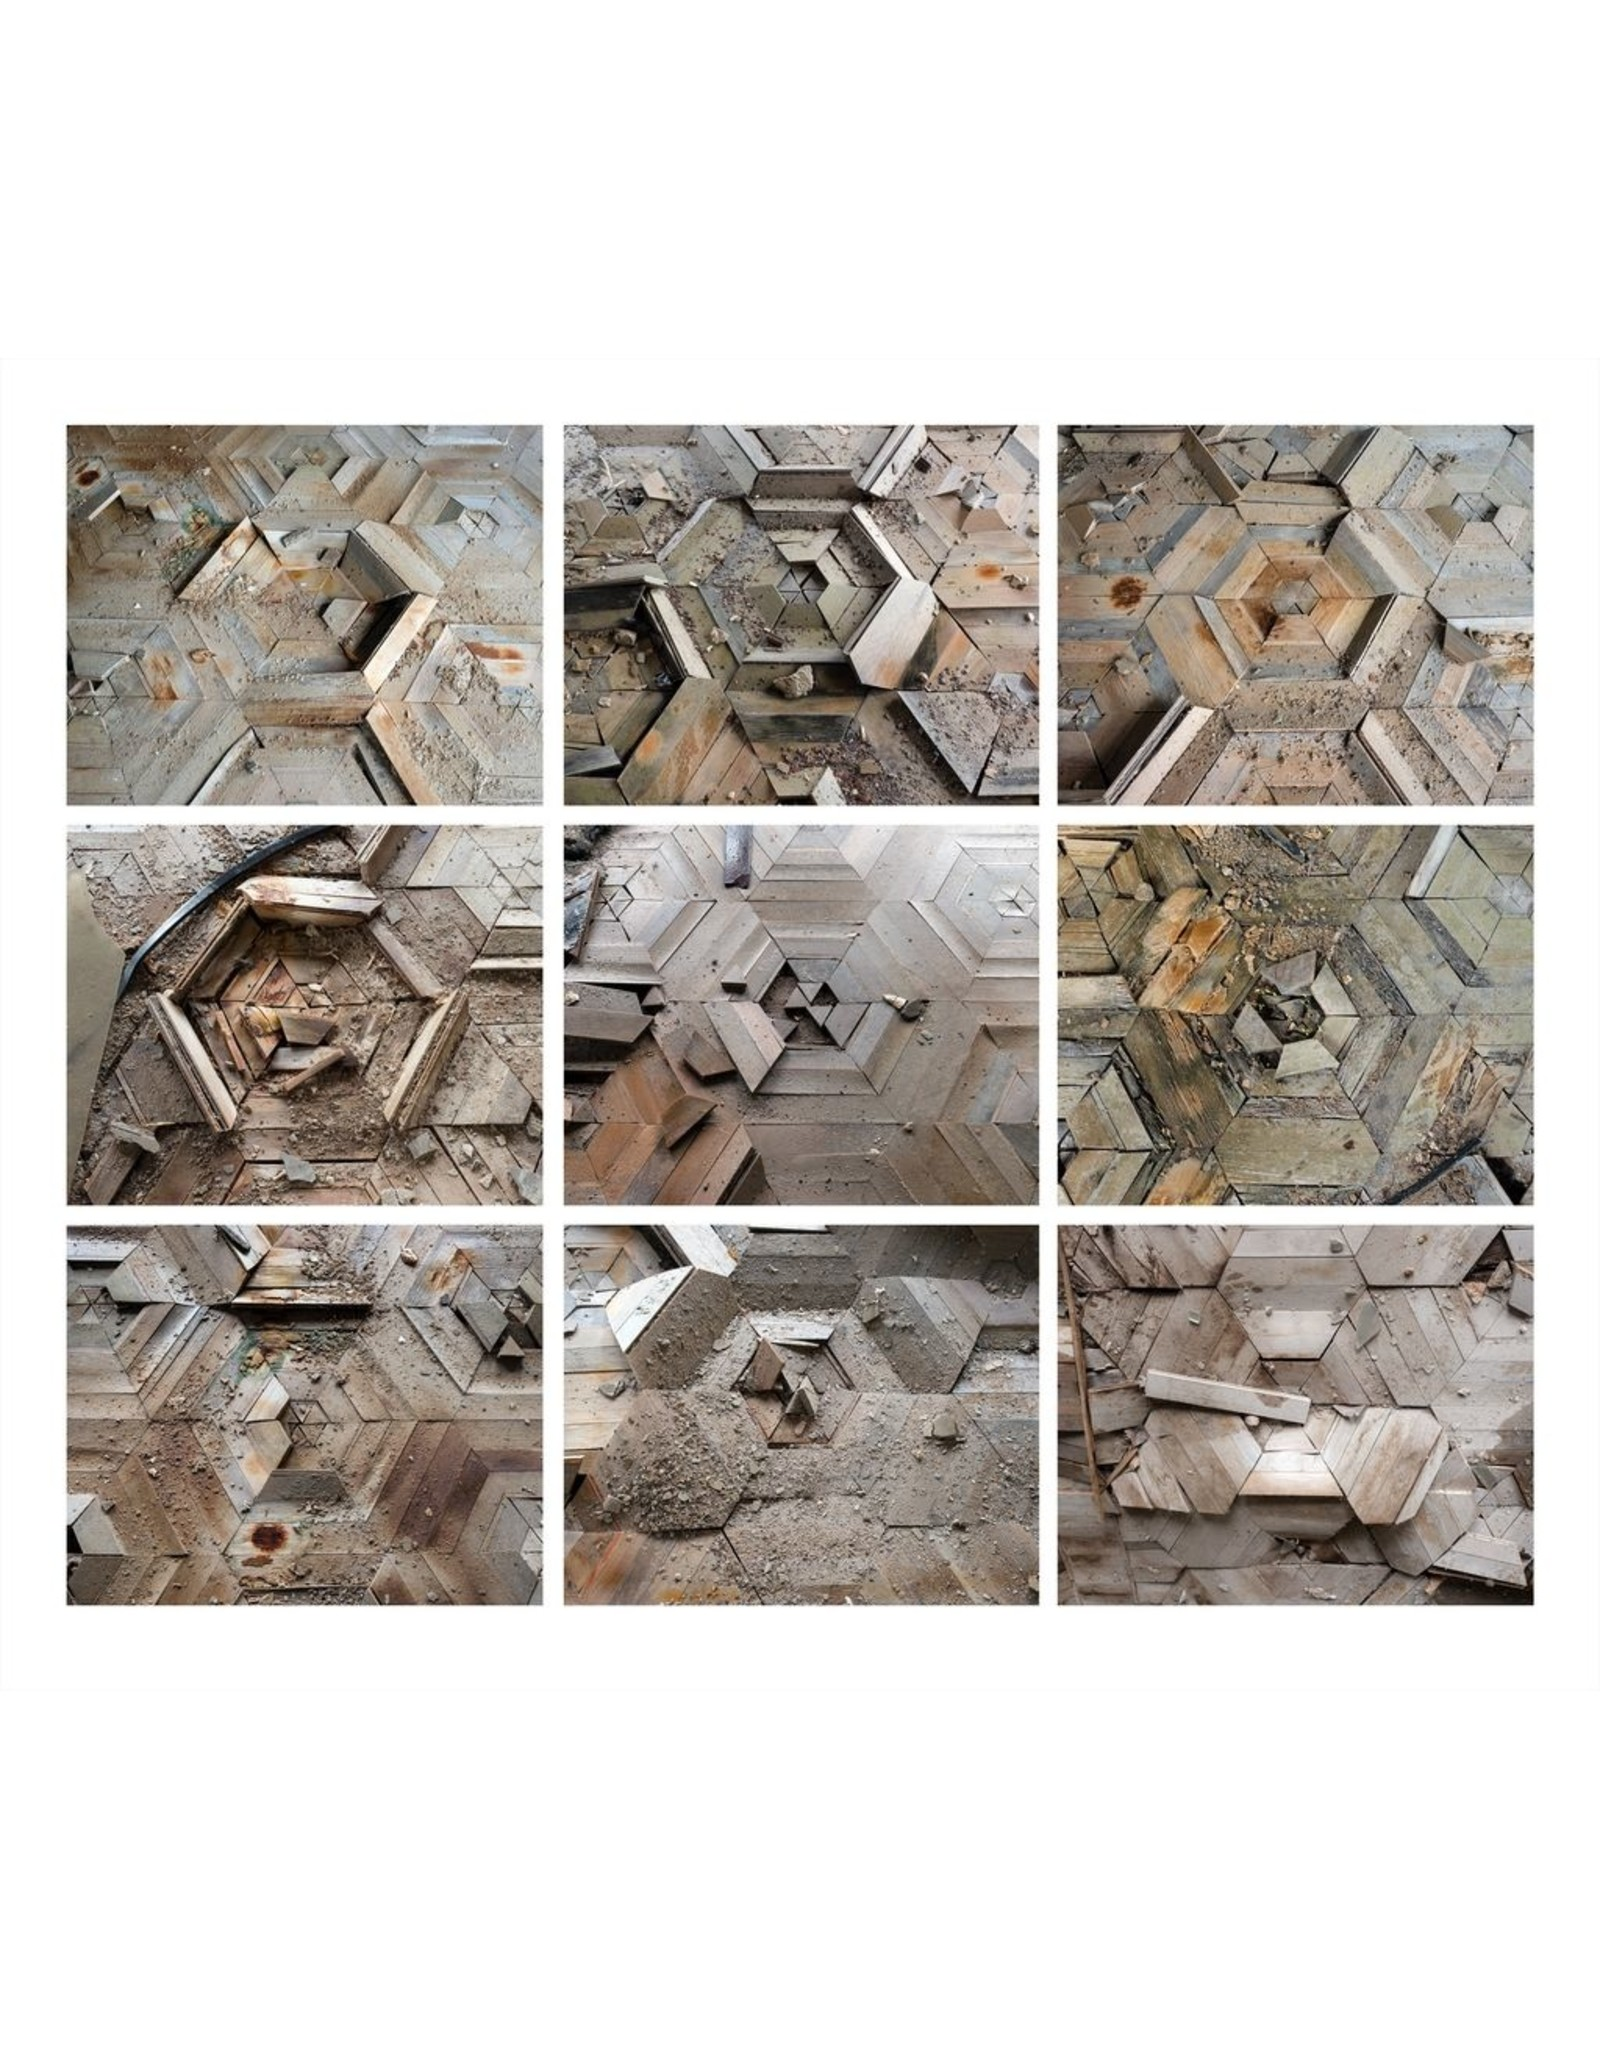 McMillan, David Parquet Floor Variations, Prypiat, Ukraine, David McMillan